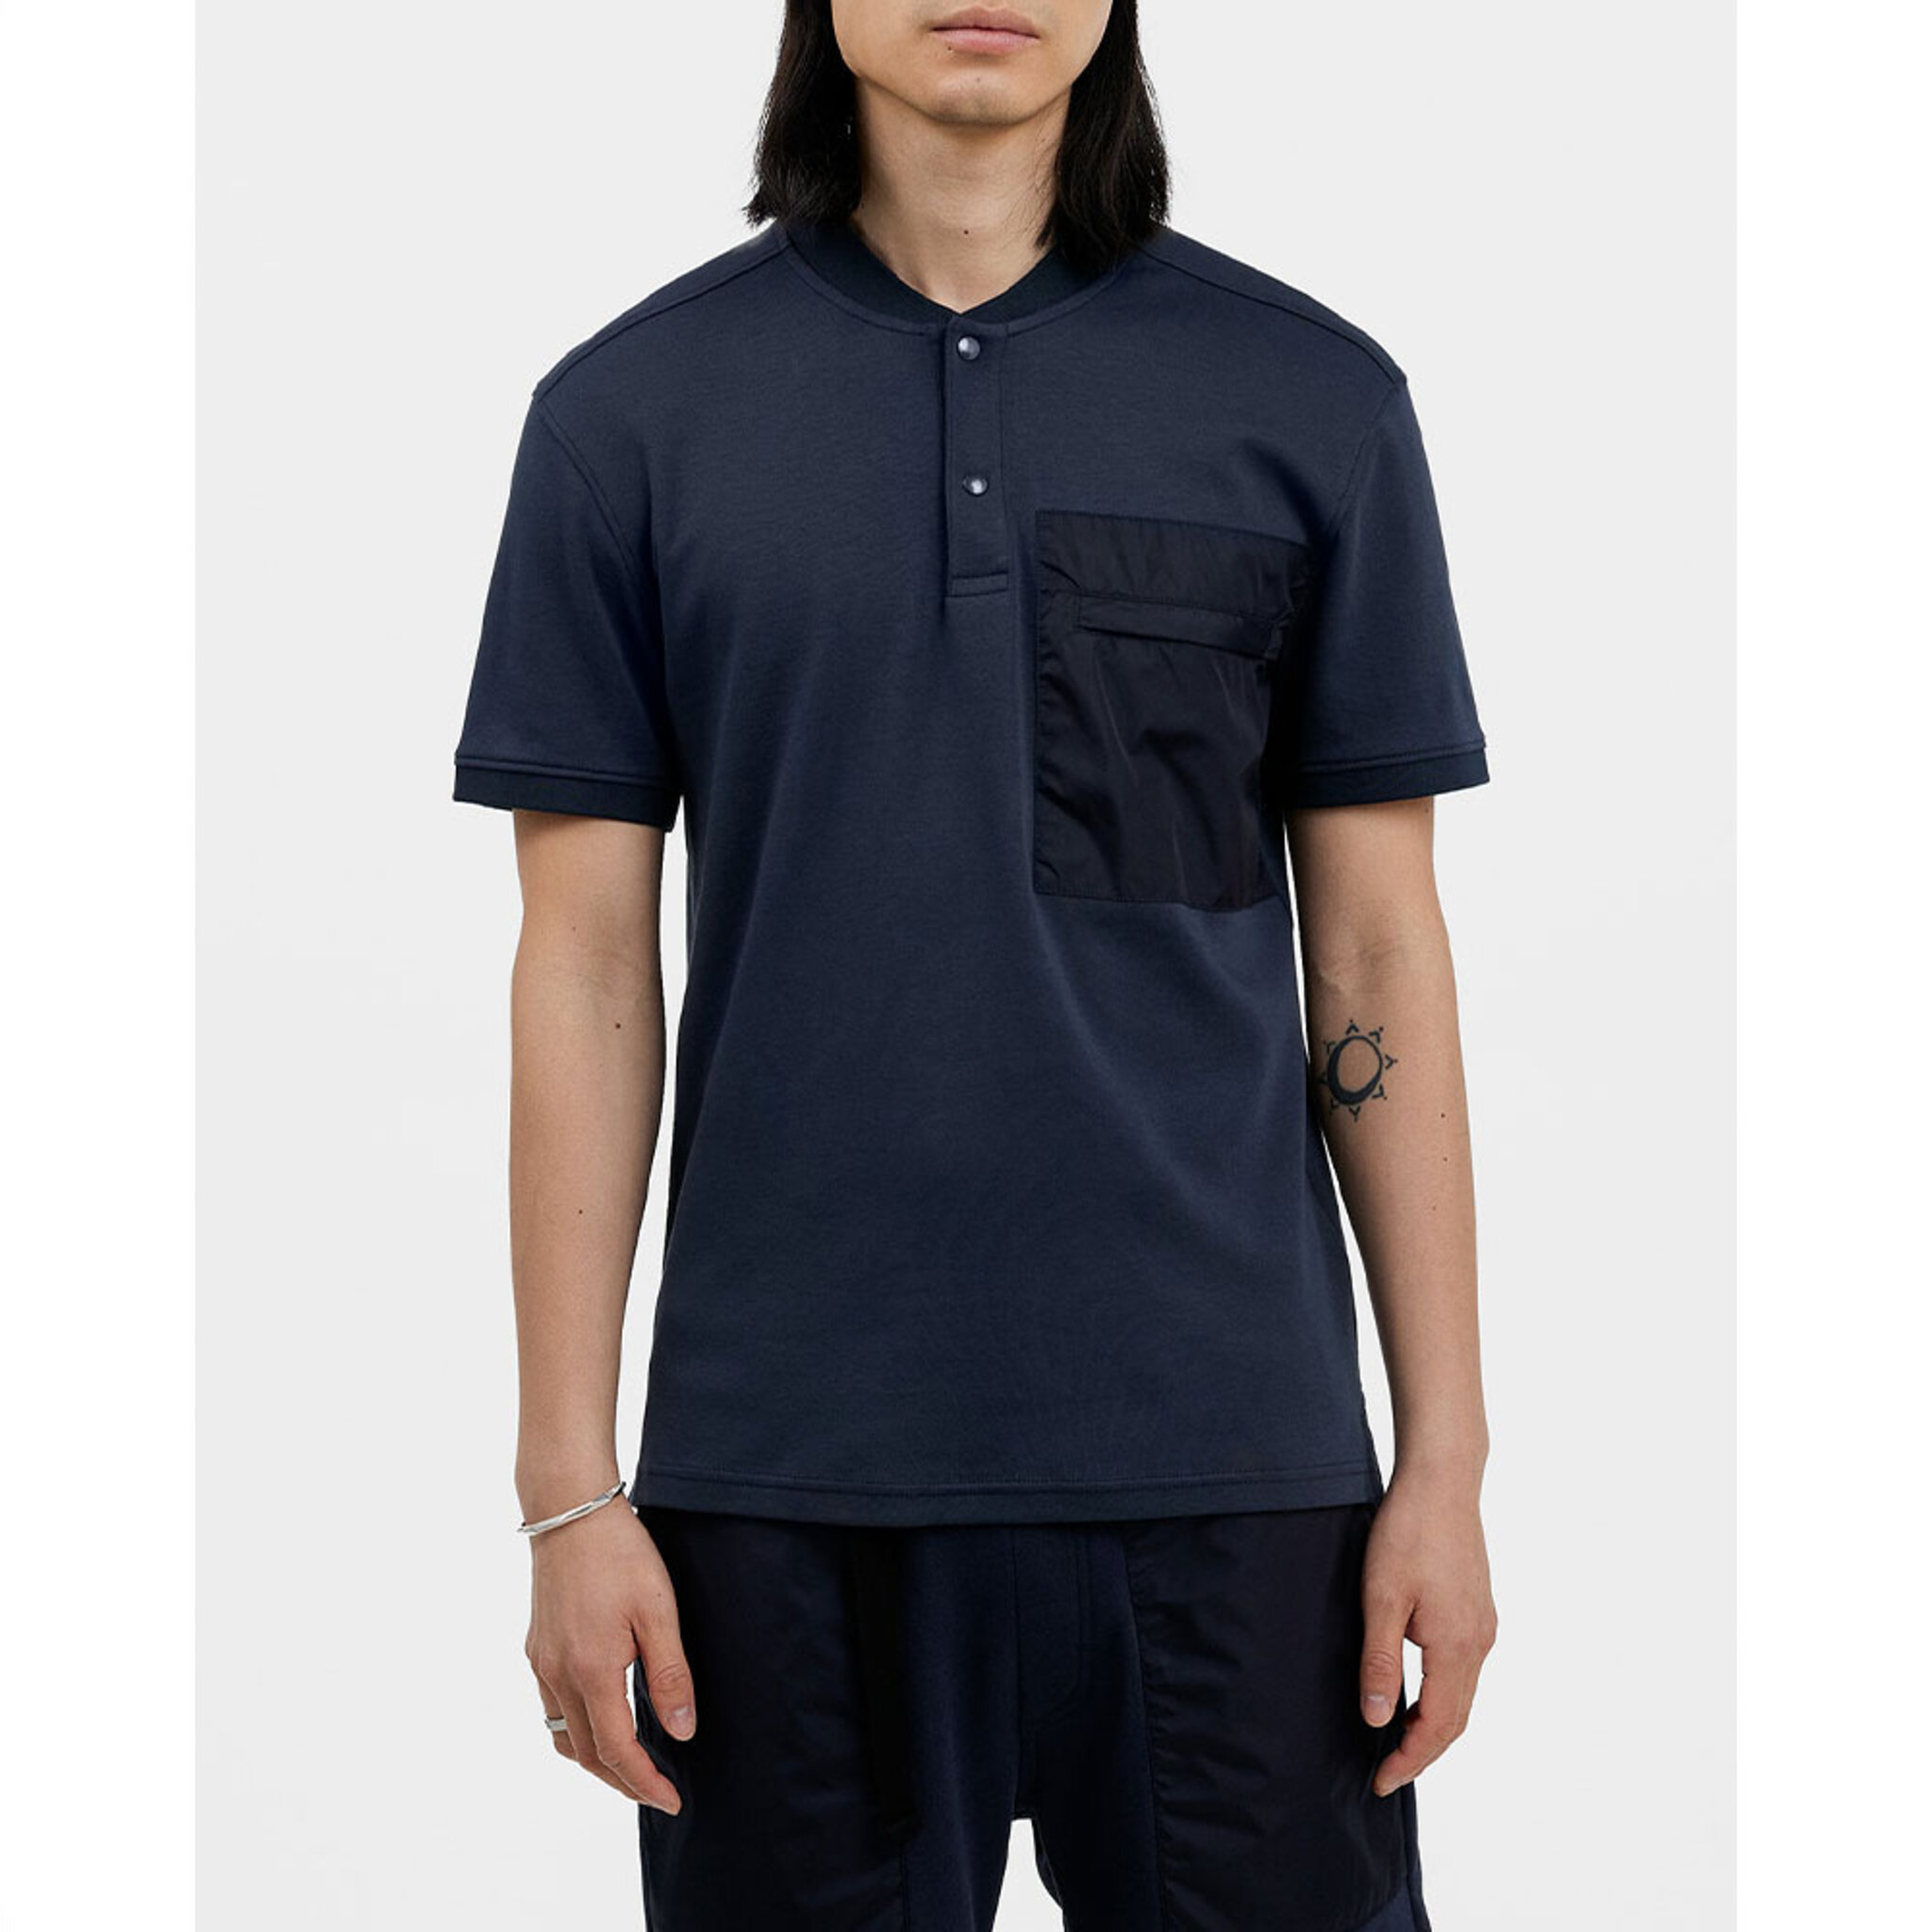 Luis Pocket Polo Shirt